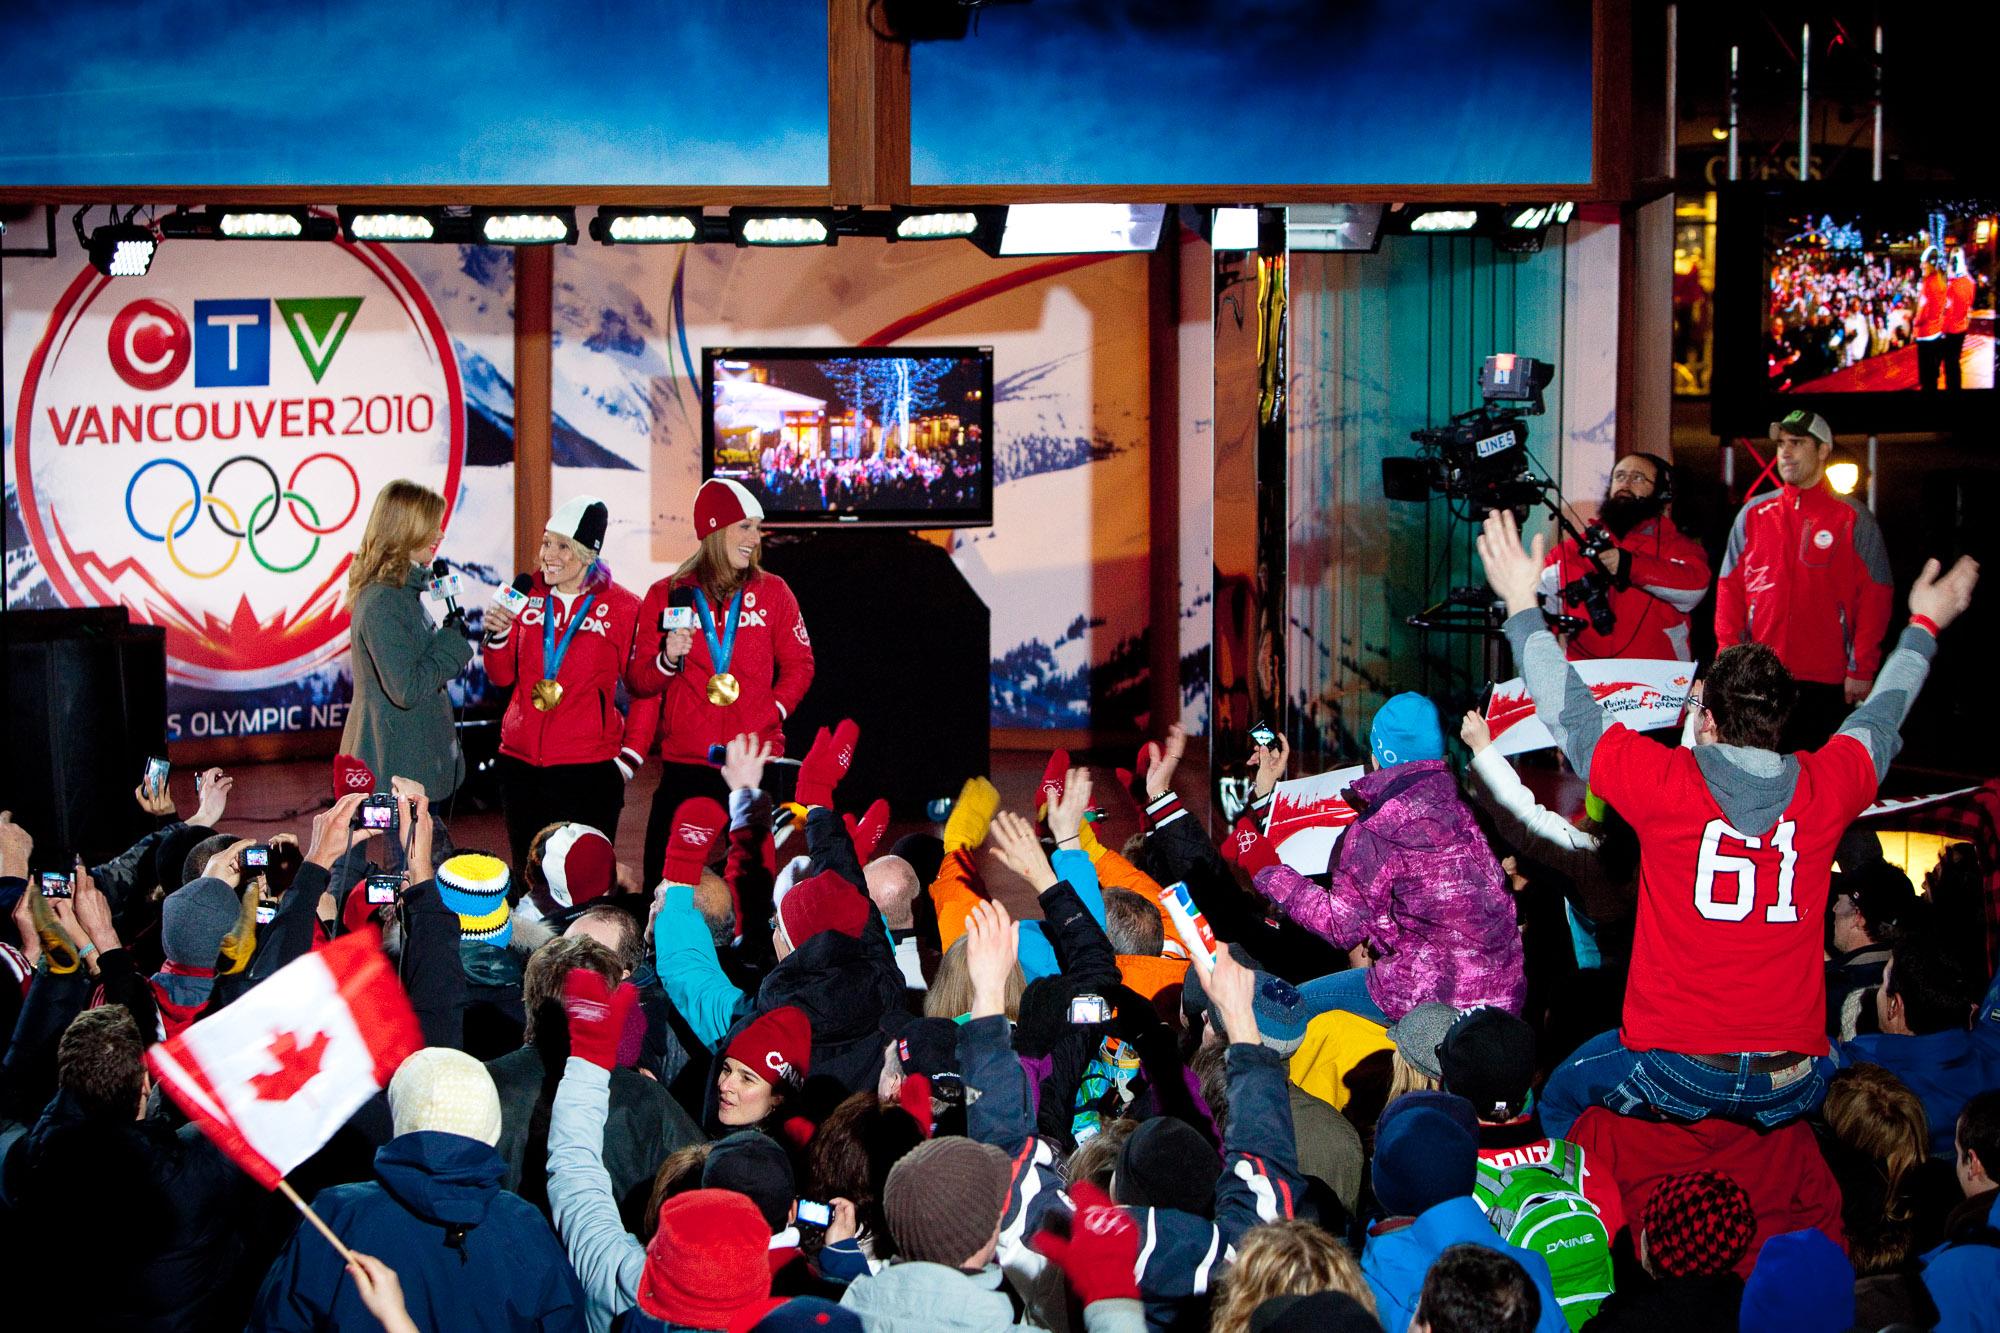 Justa-Jeskova-sport-events-photography-JJ006788.jpg